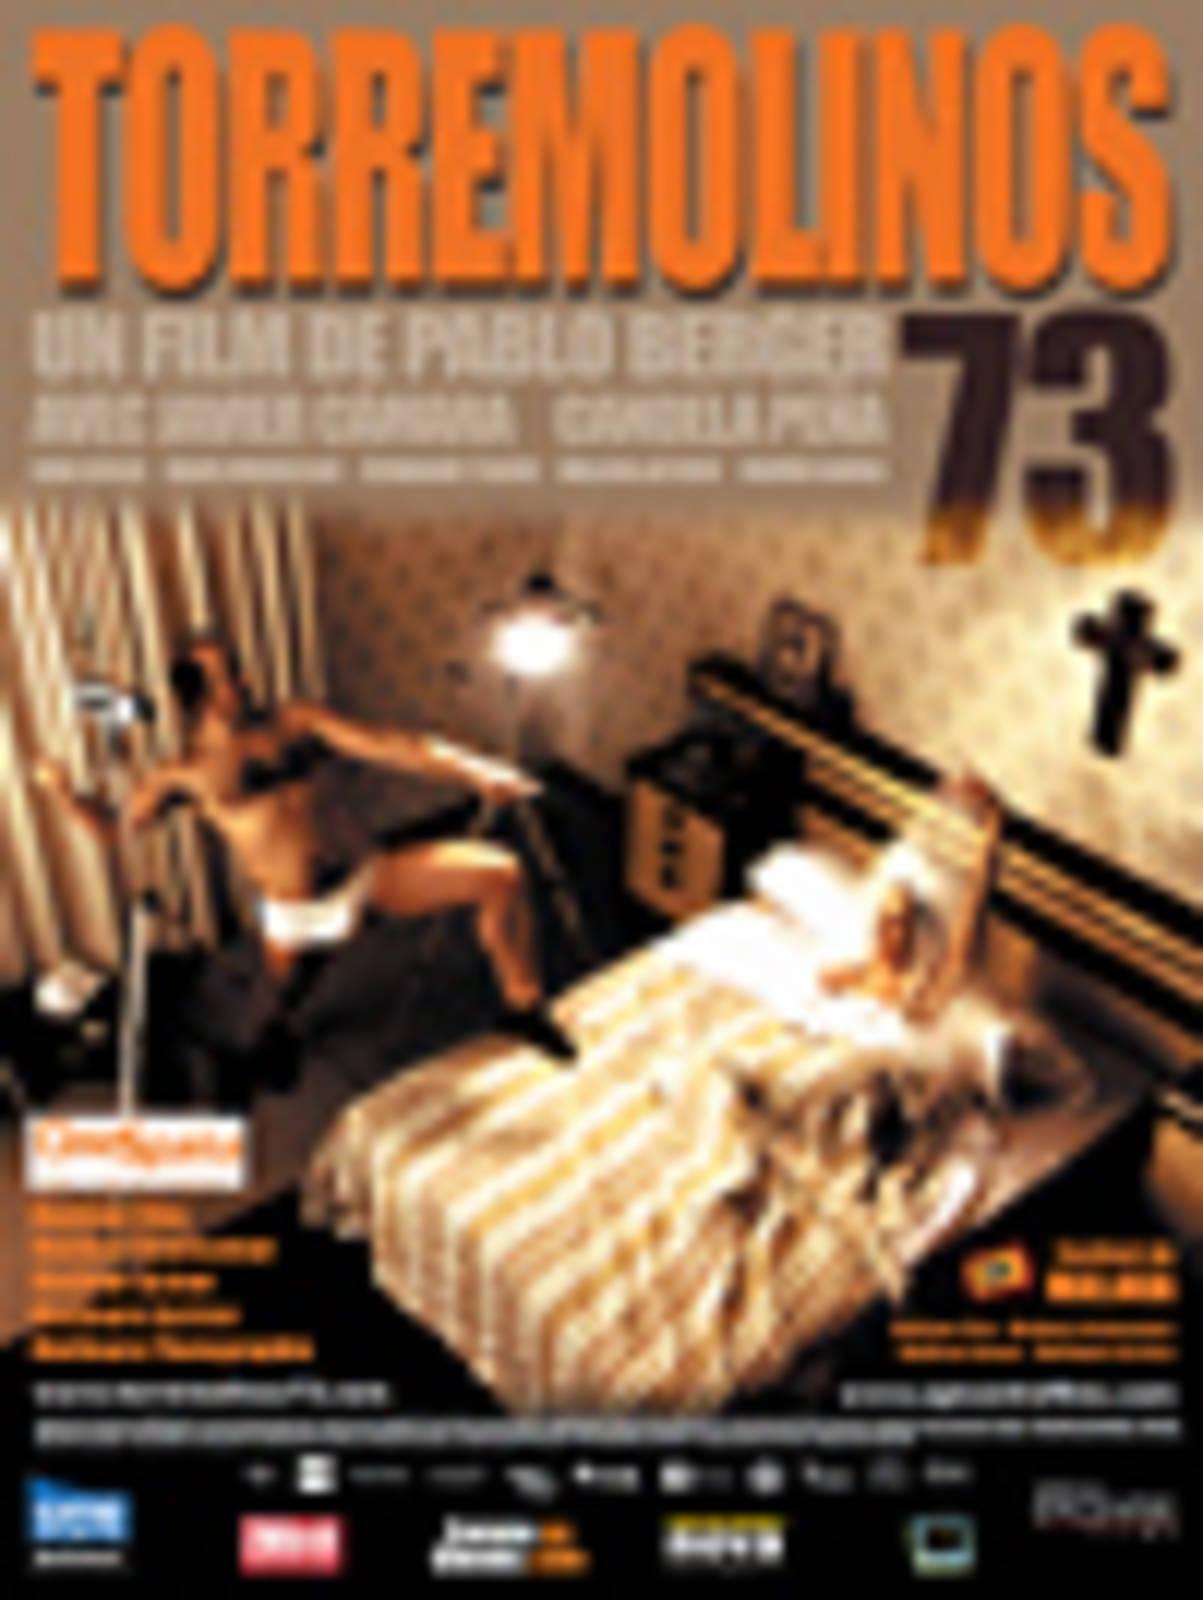 Candela pena torremolinos 73